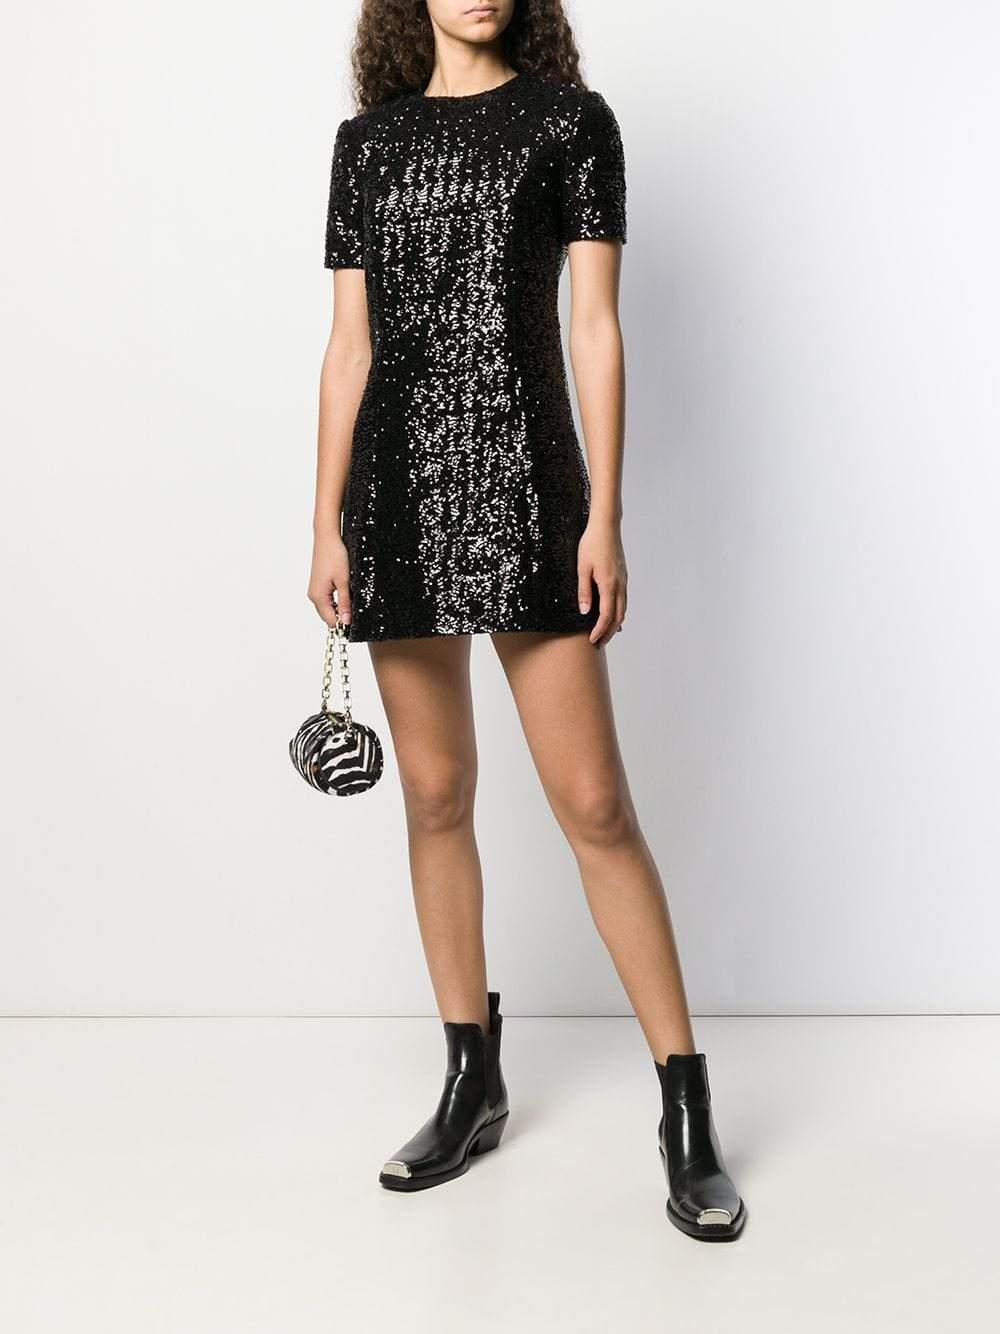 SAINT LAURENT Round Neck Sequin Mini Dress